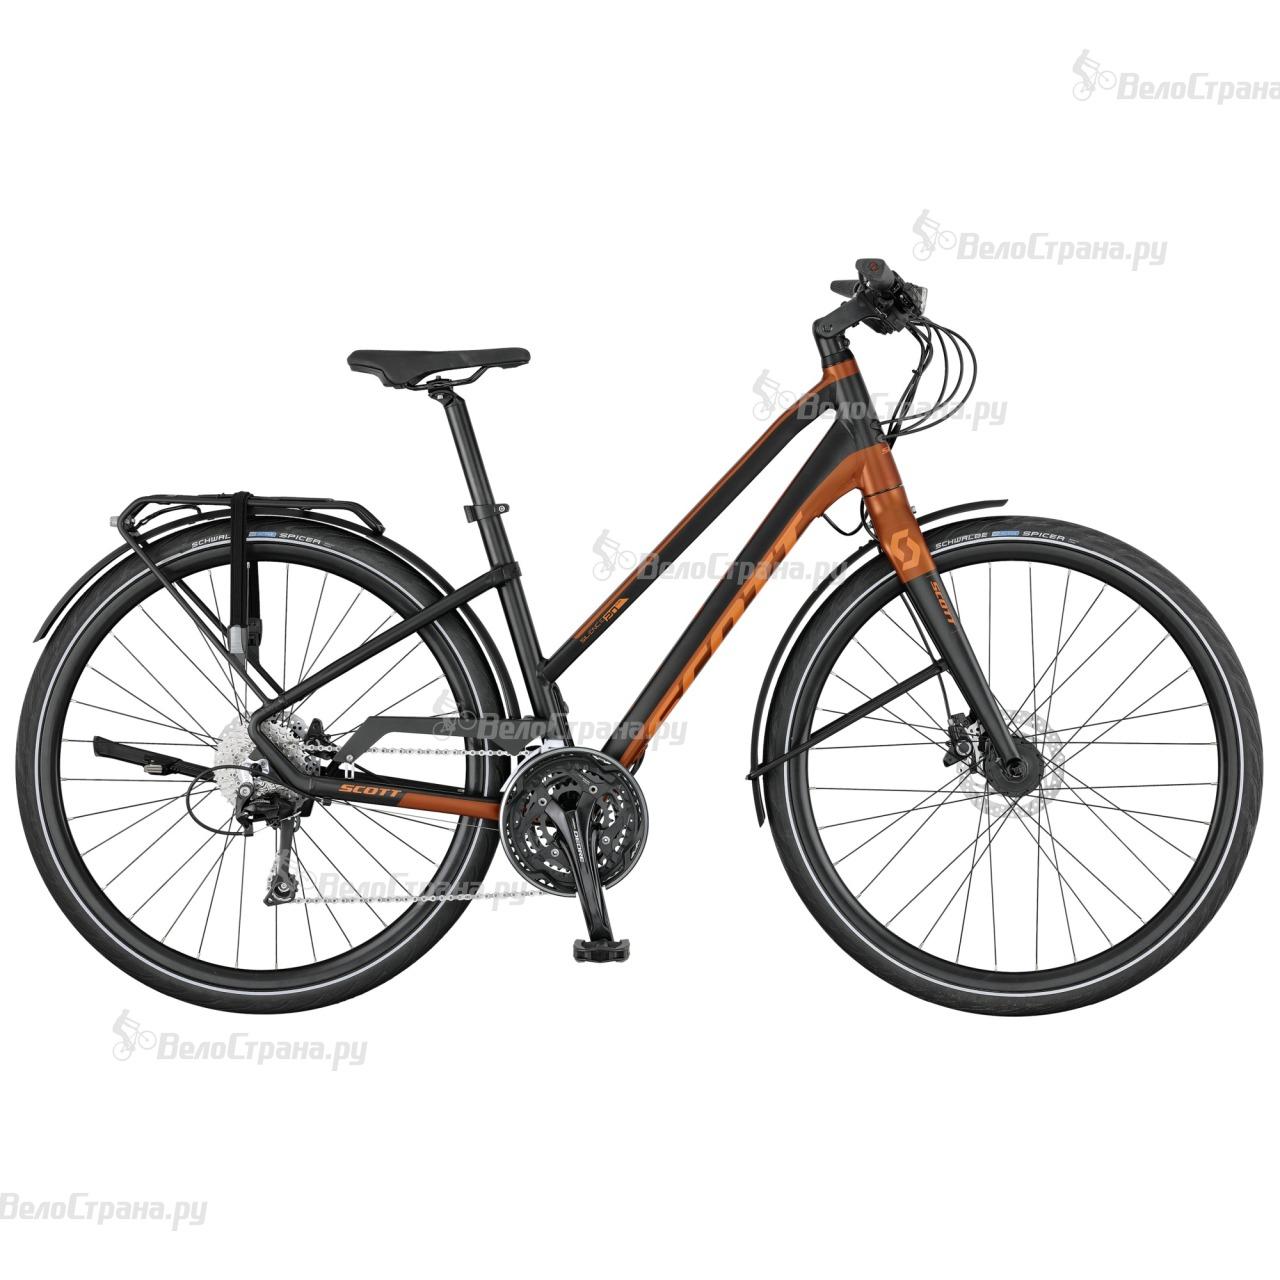 Велосипед Scott Silence 20 Lady (2017) велосипед scott e silence evo 2017